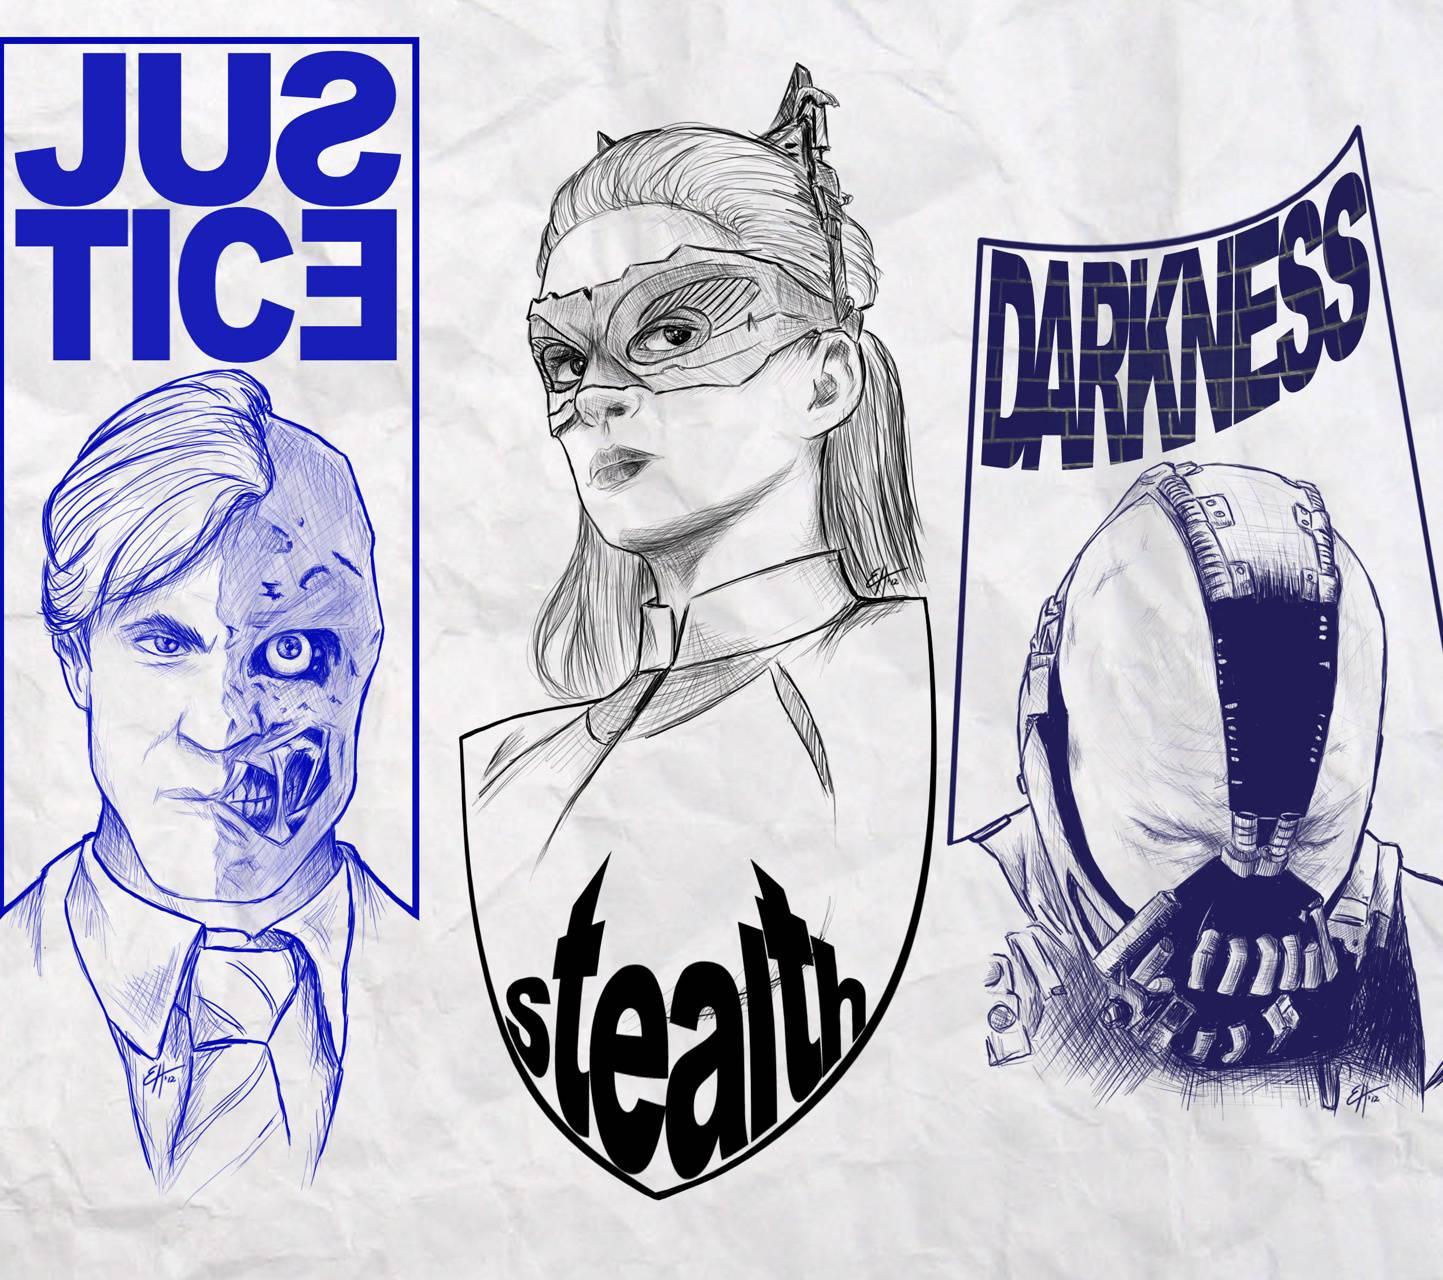 Batman Enemies